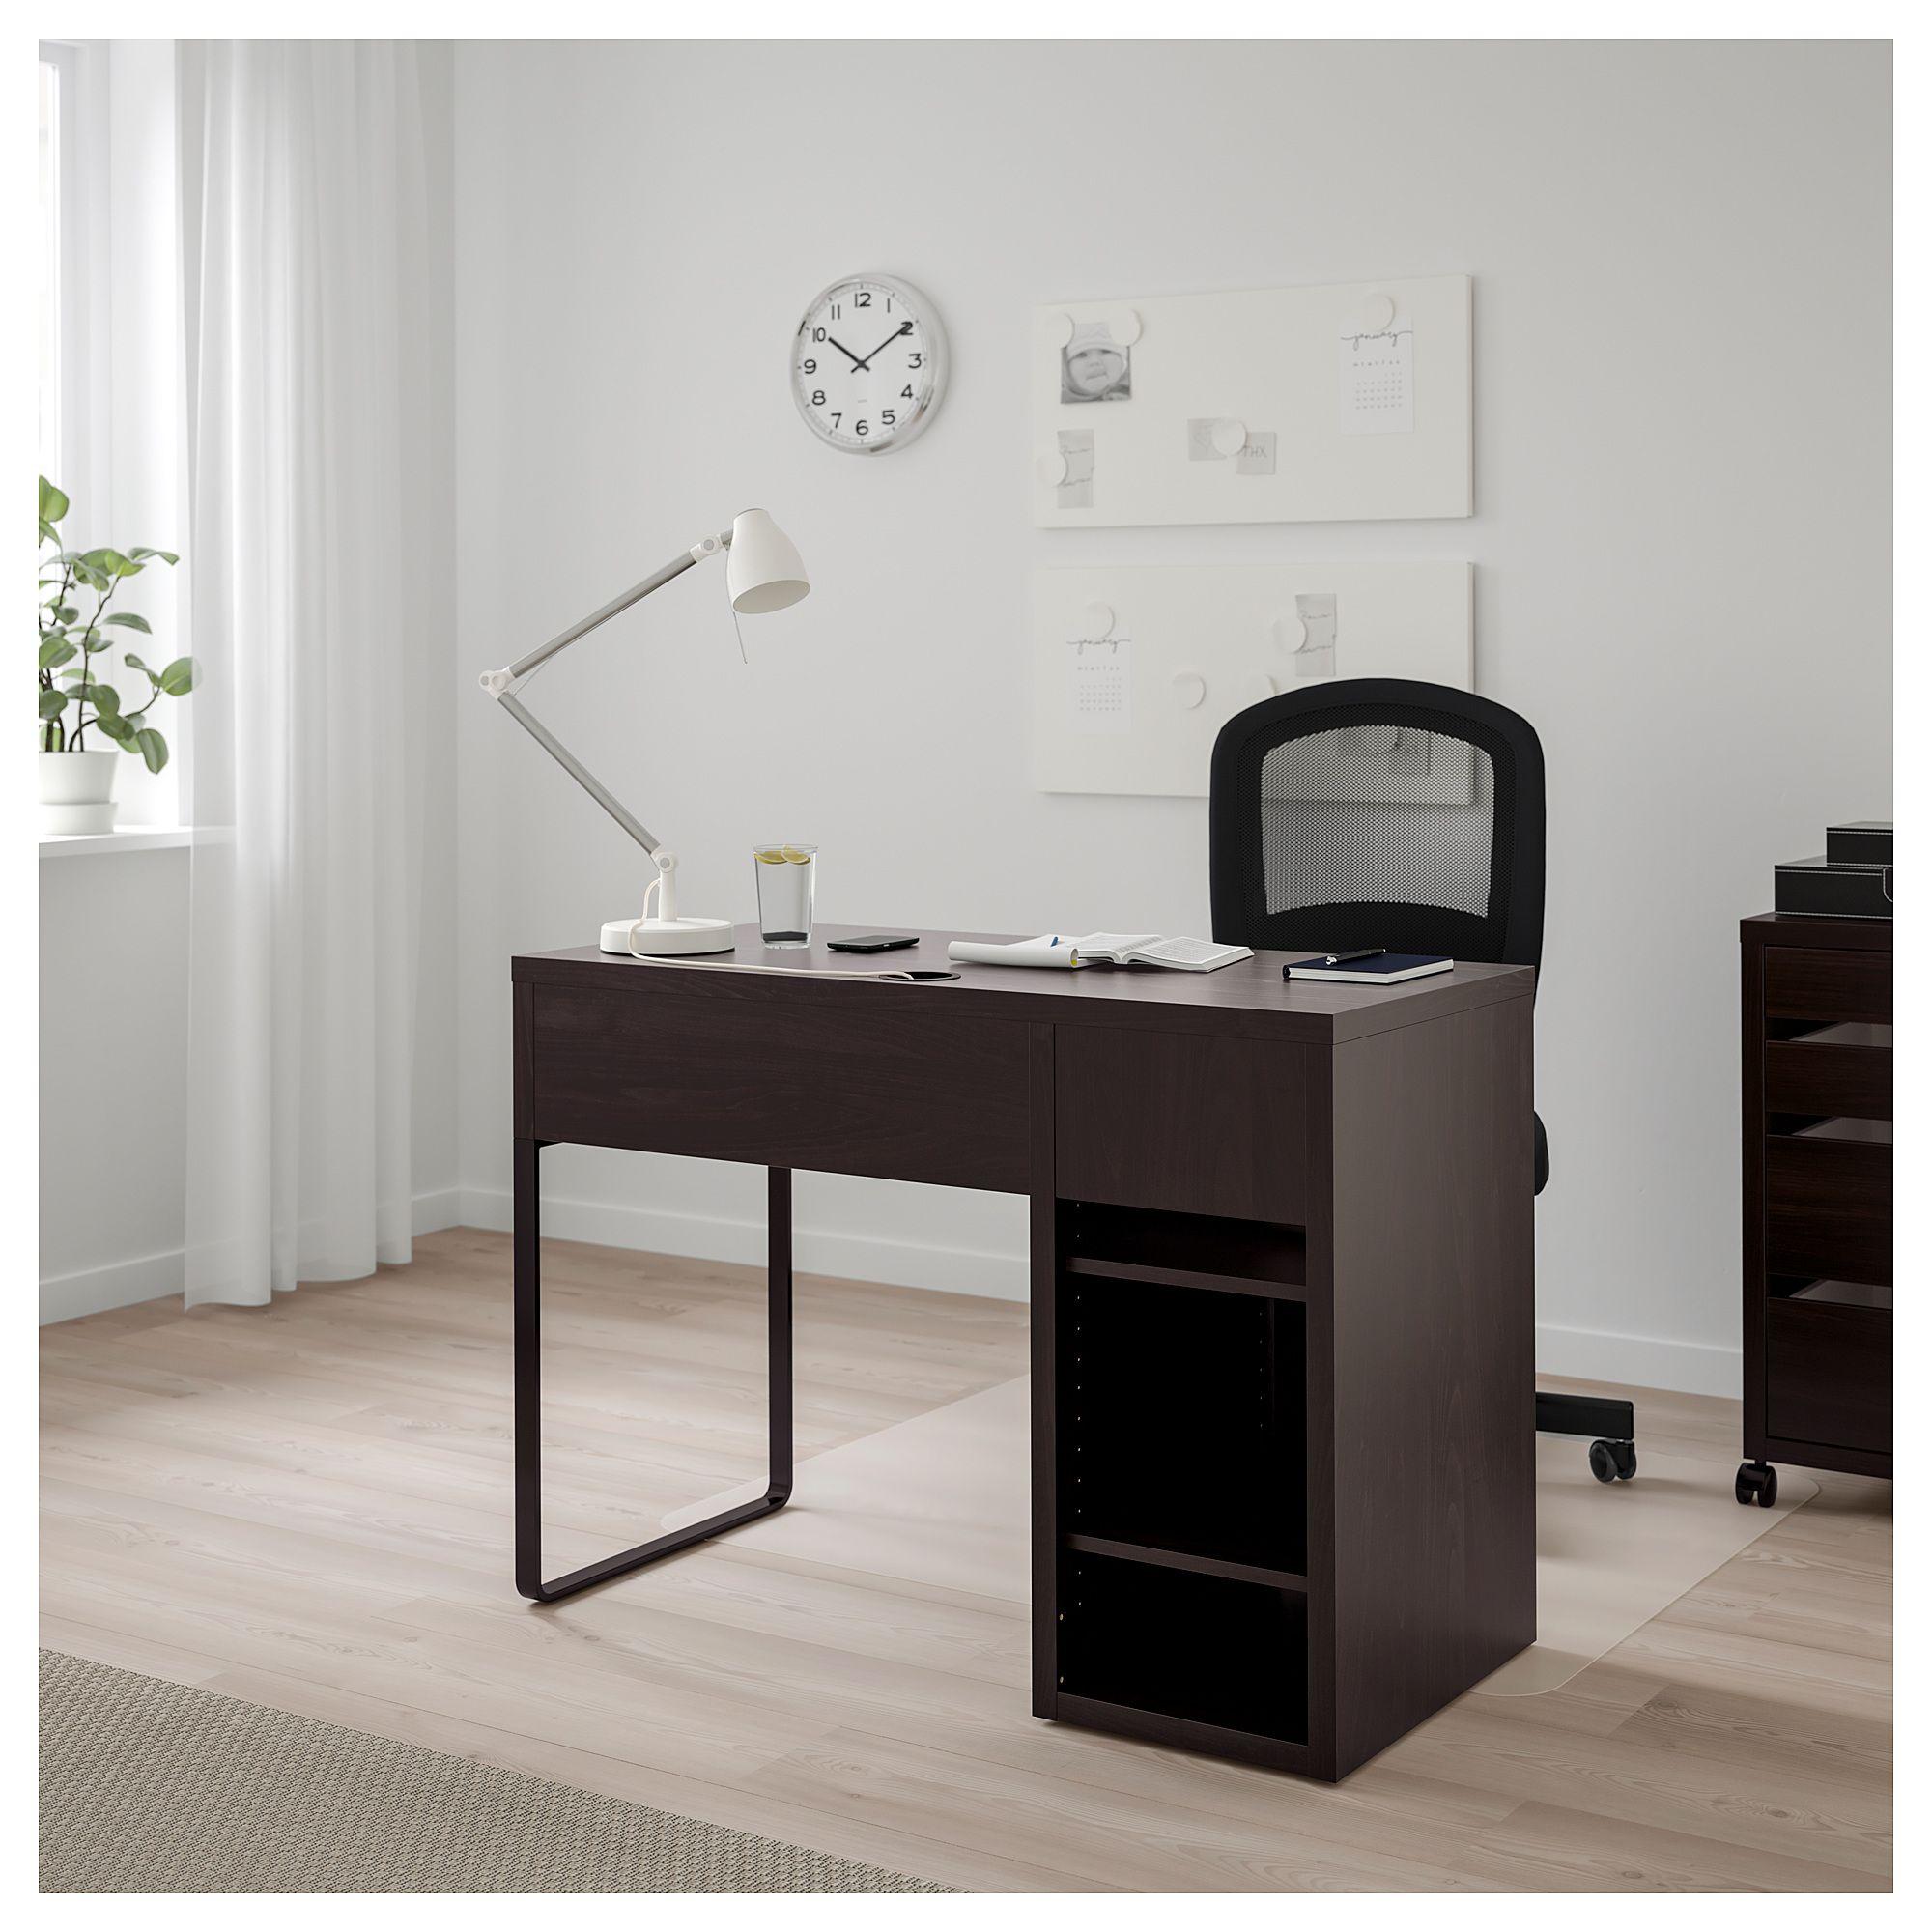 Micke Desk Black Brown Ikea Canada Ikea Black Office Furniture Black Desk Micke Desk